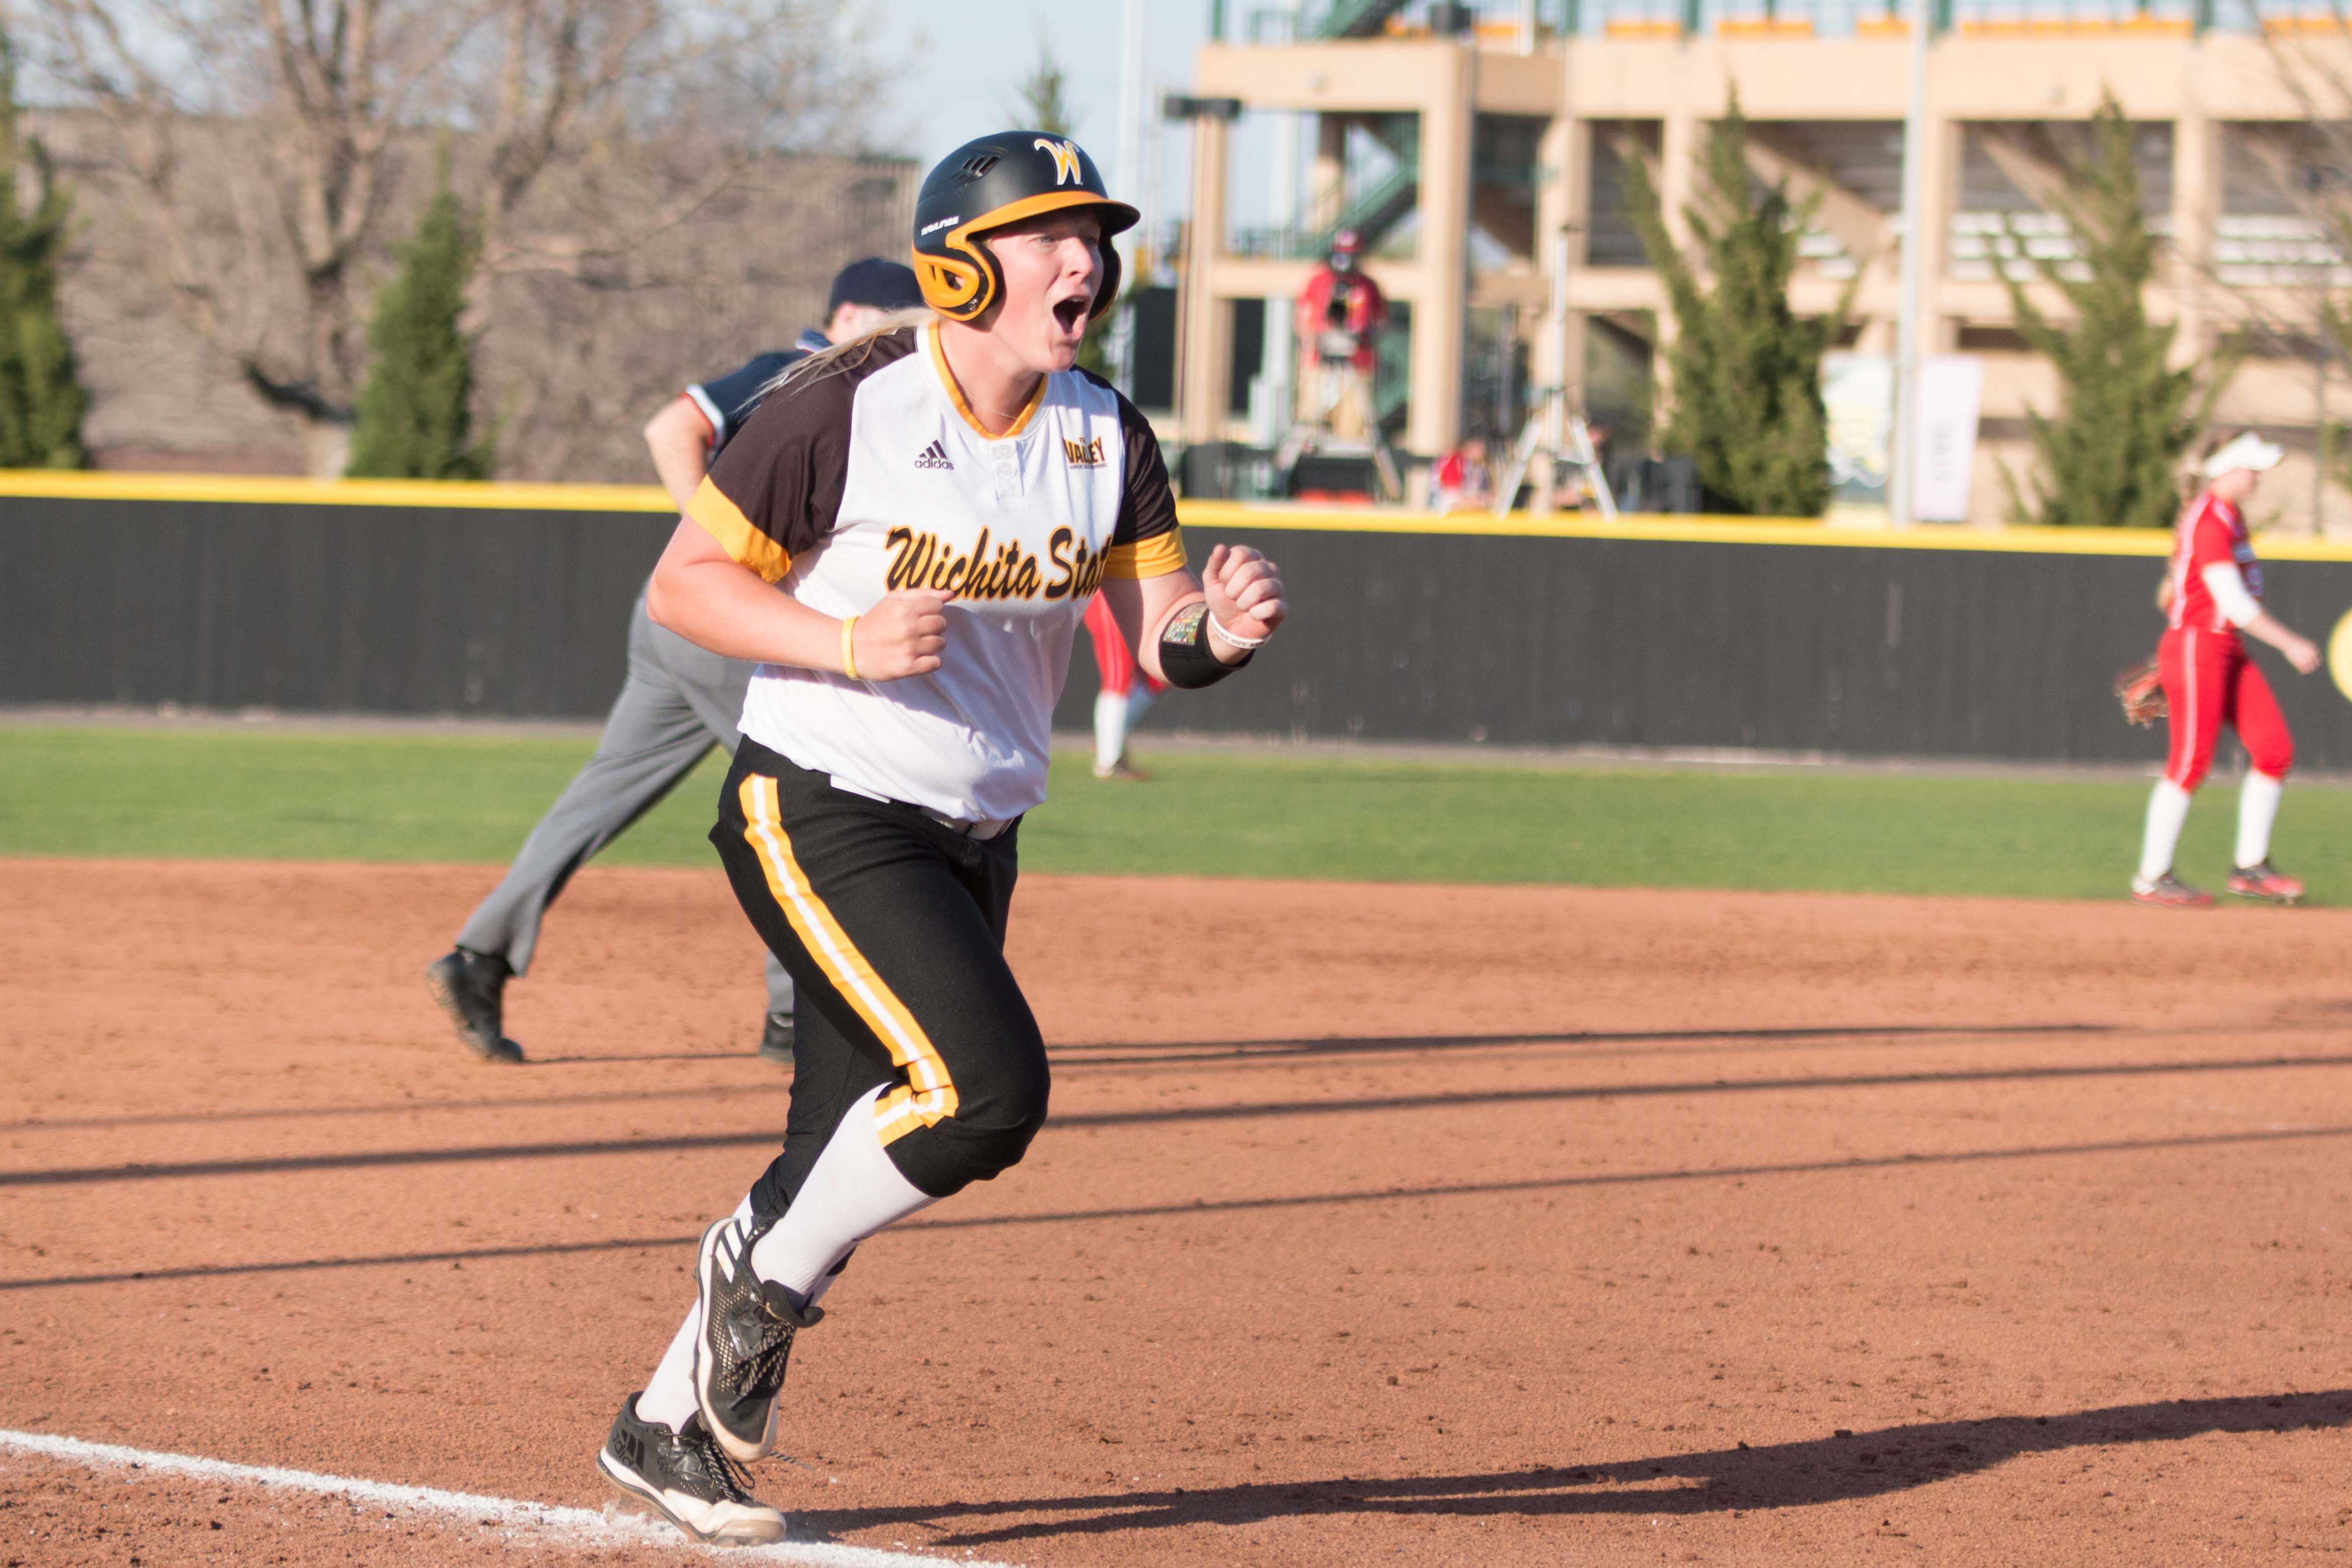 Senior Macklin Hitz cheers as she  runs to home base after hitting a homerun against Nebraska.